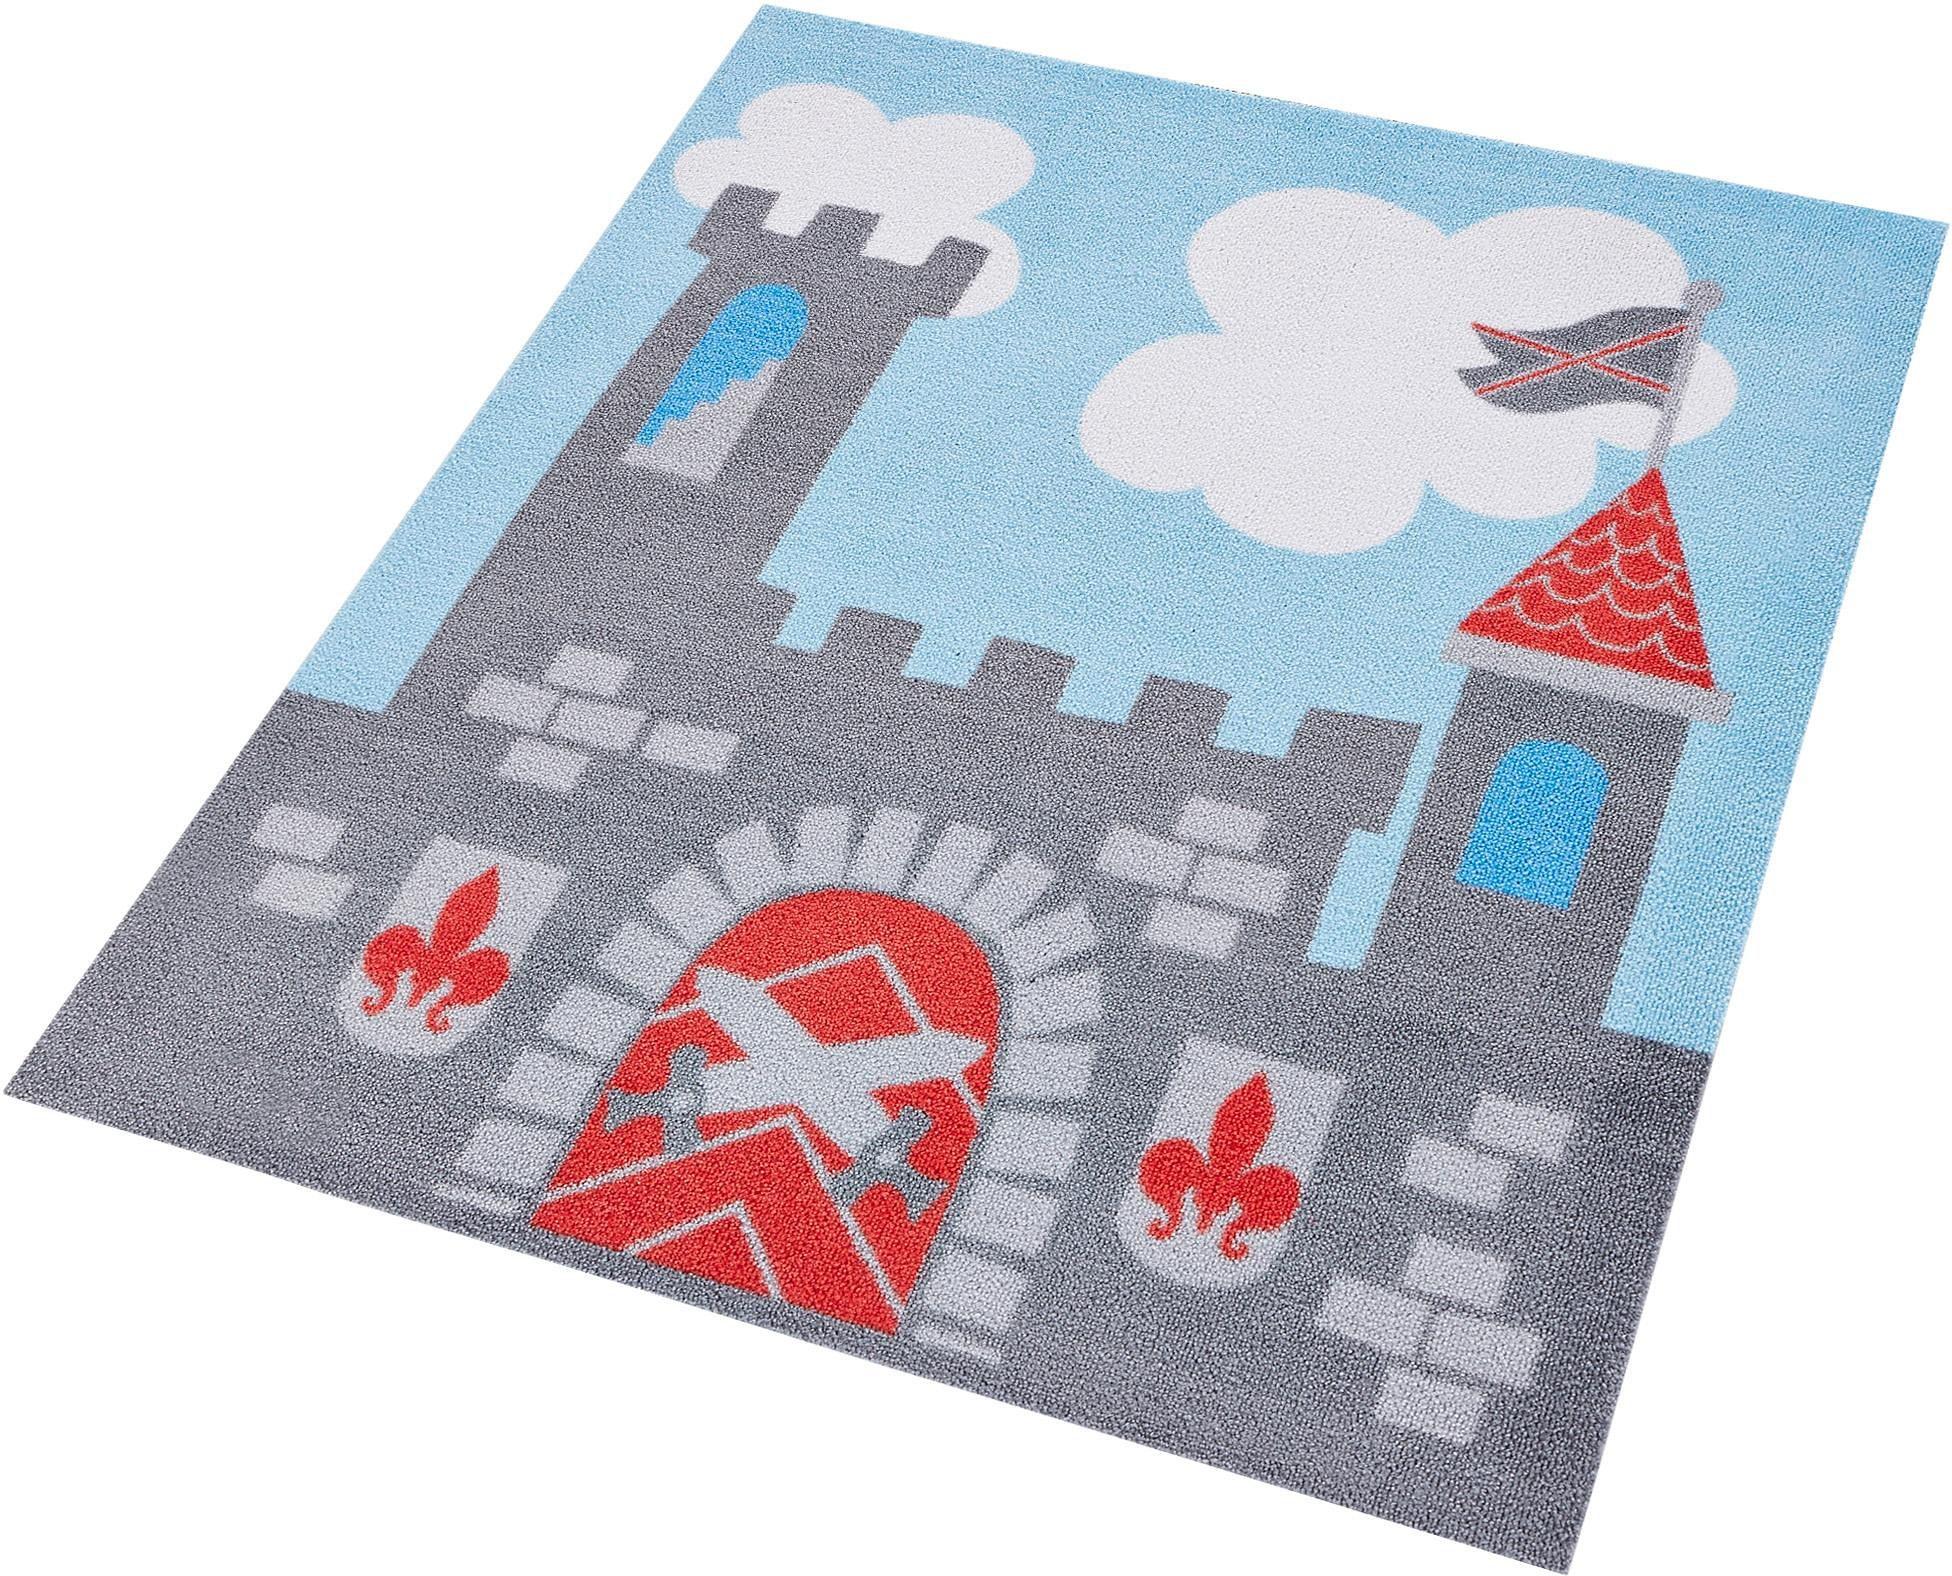 Kinder-Teppich, Zala Living, »Ritterburg«, getuftet